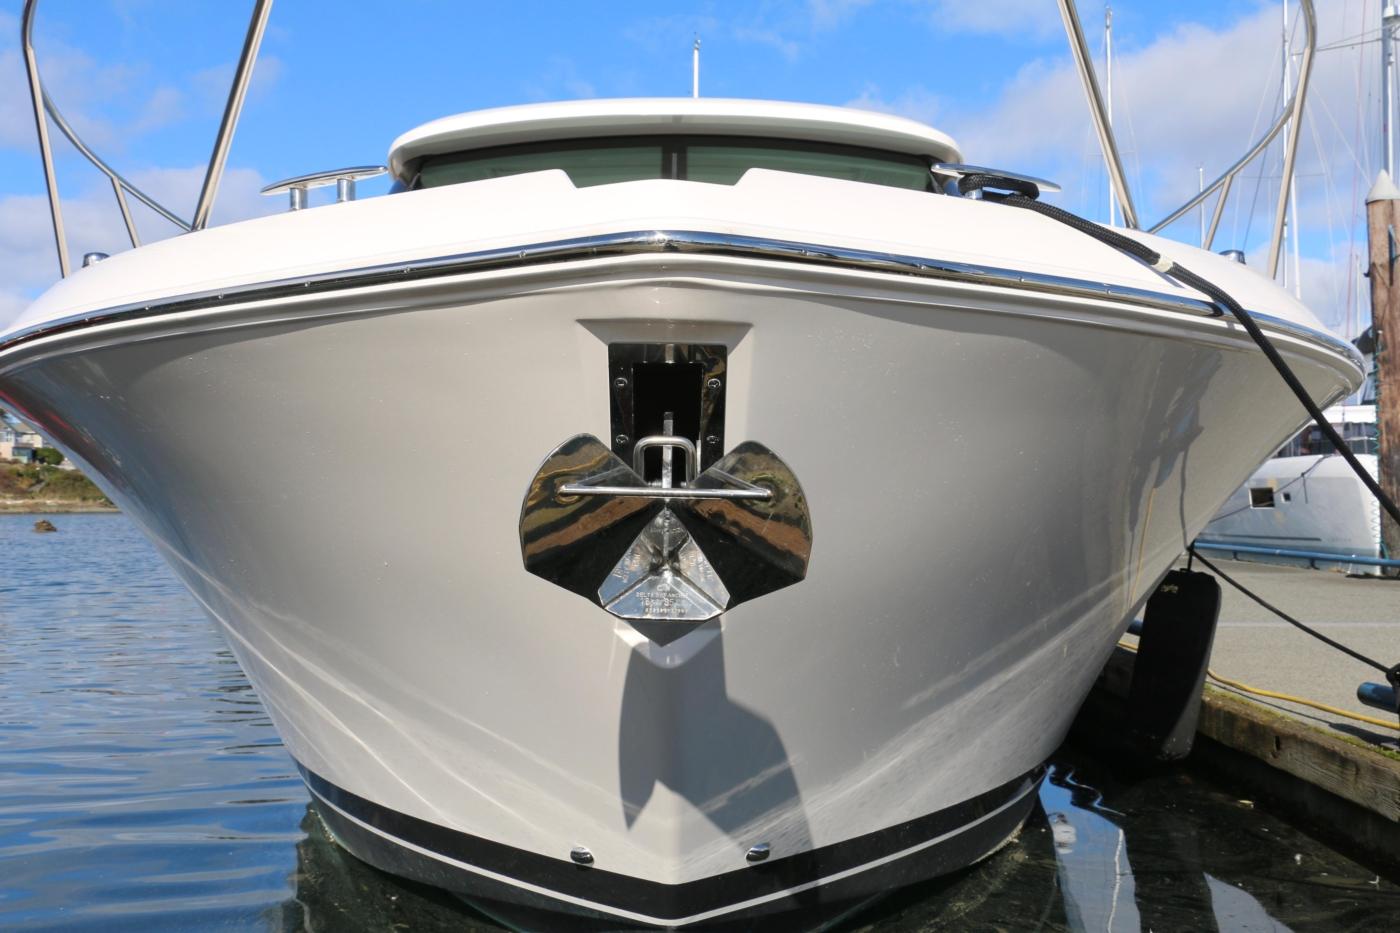 2018 Tiara Yachts 39 Coupe, Anchor